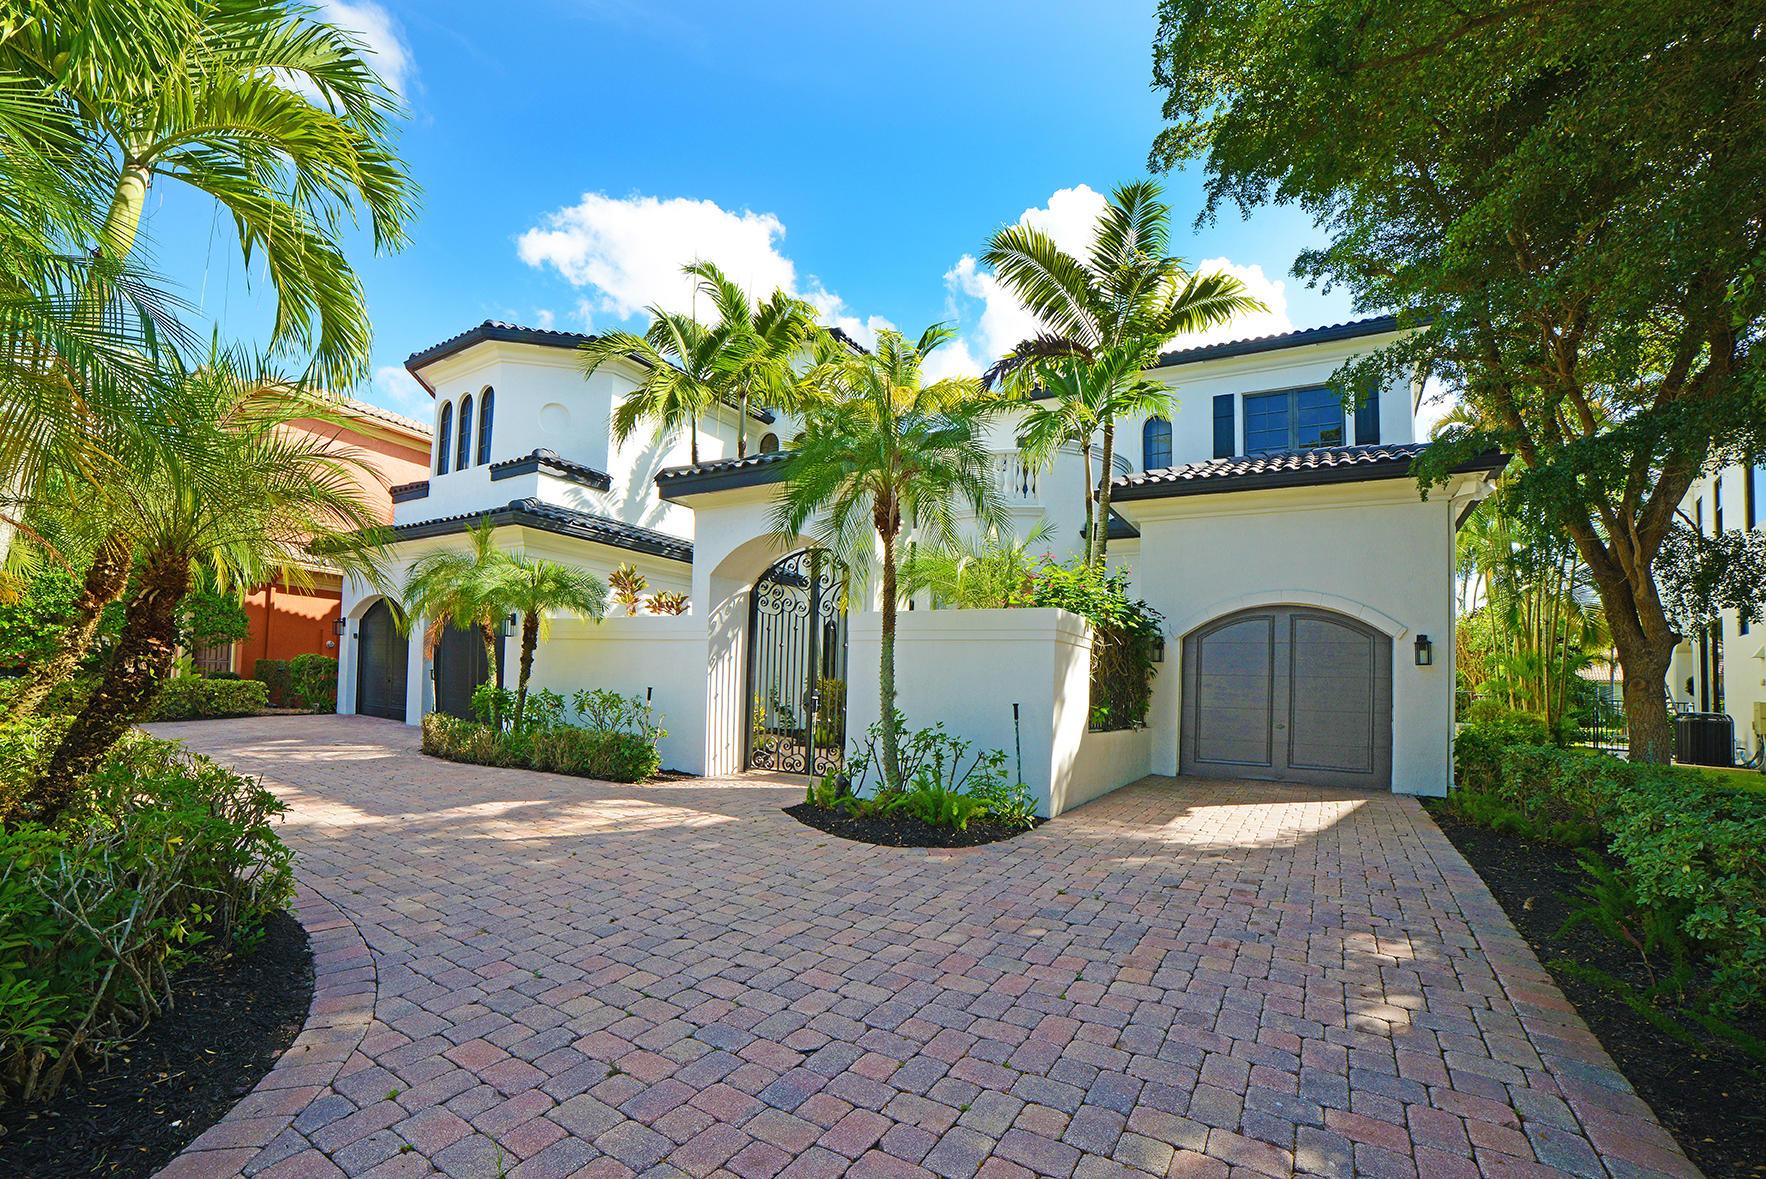 Photo of  Boca Raton, FL 33496 MLS RX-10476351